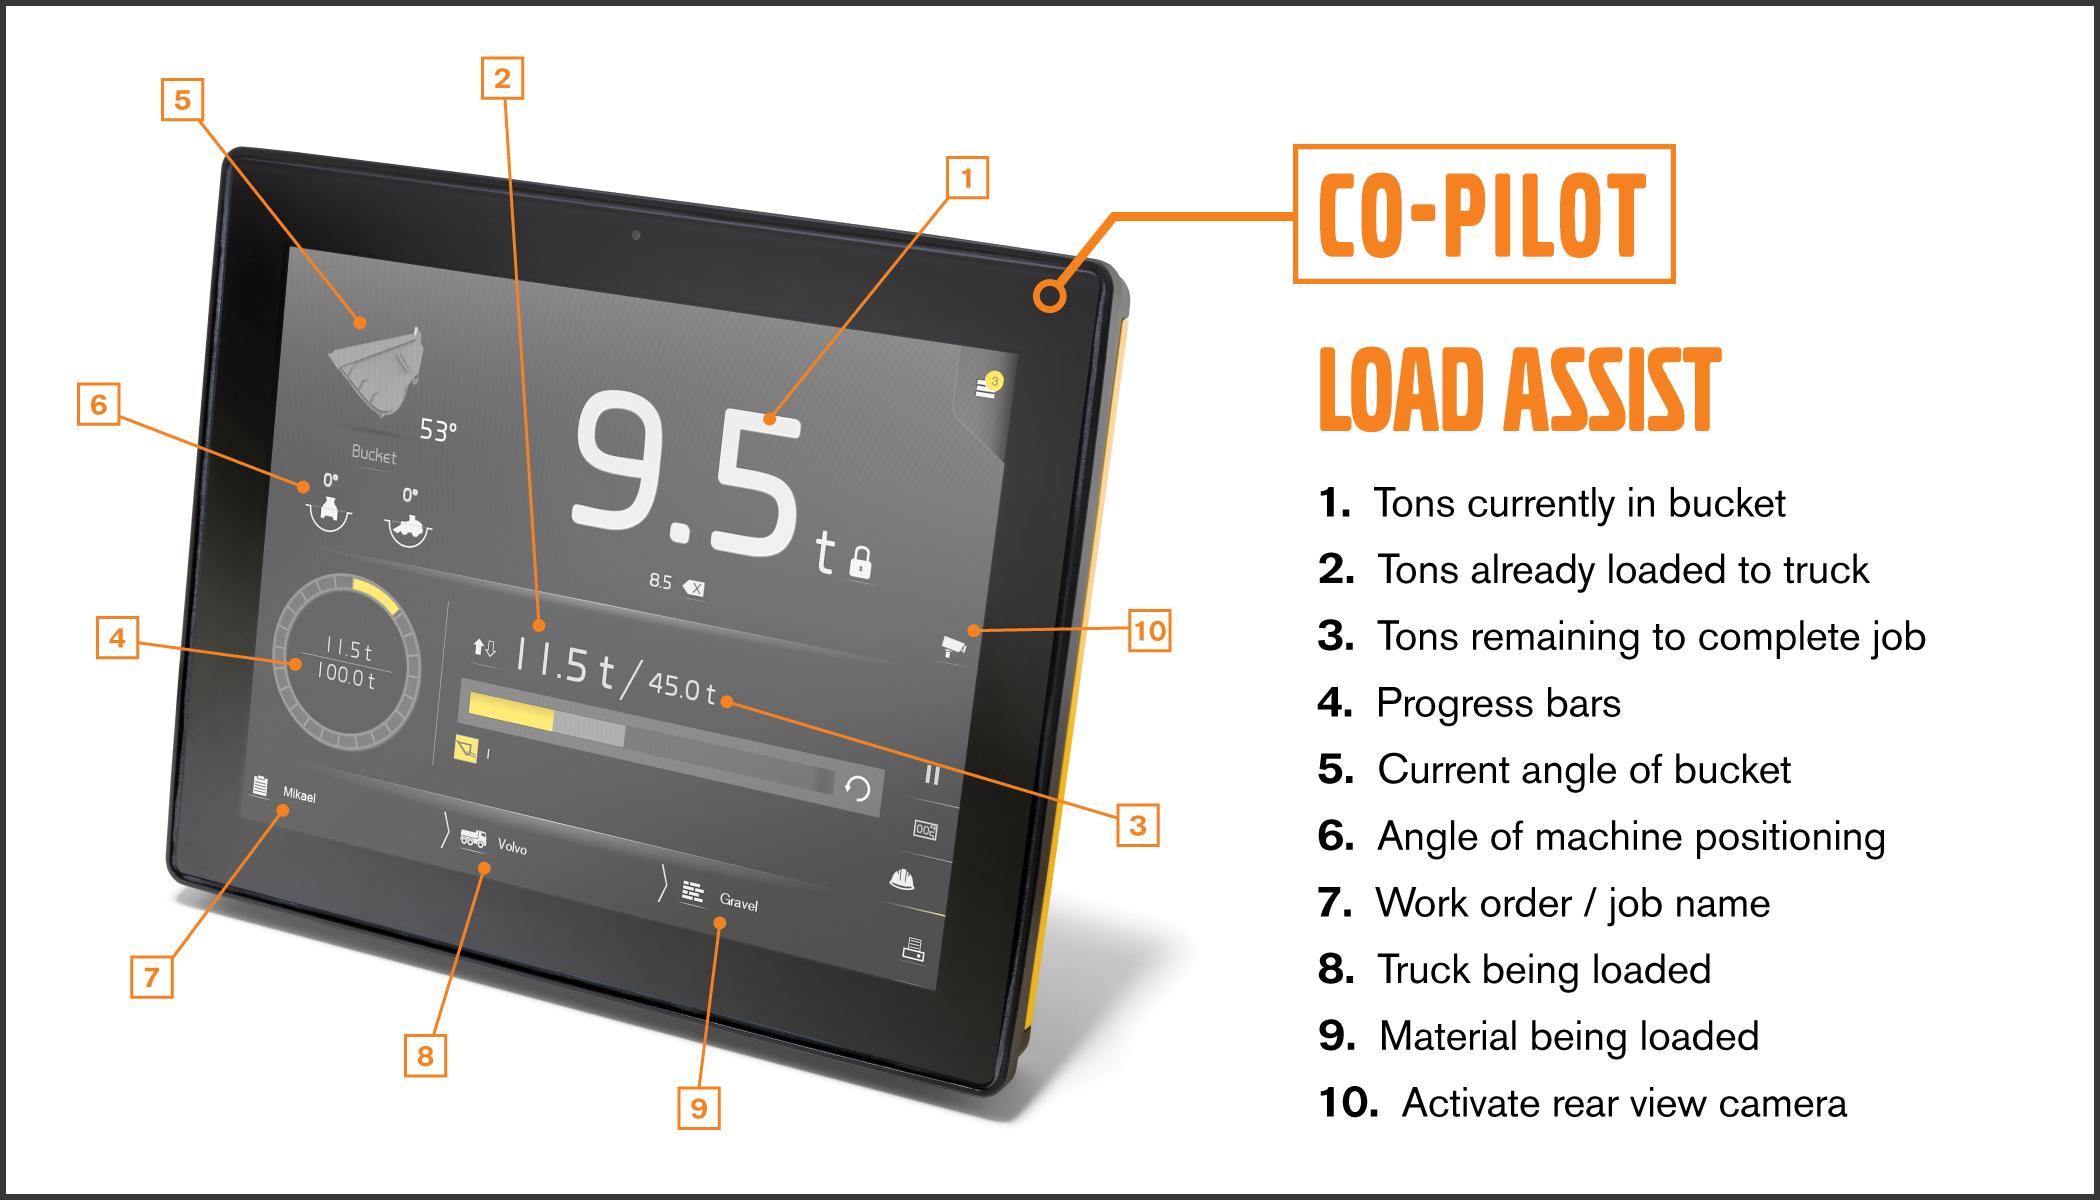 Volvo CE CoPilot Load-Assist